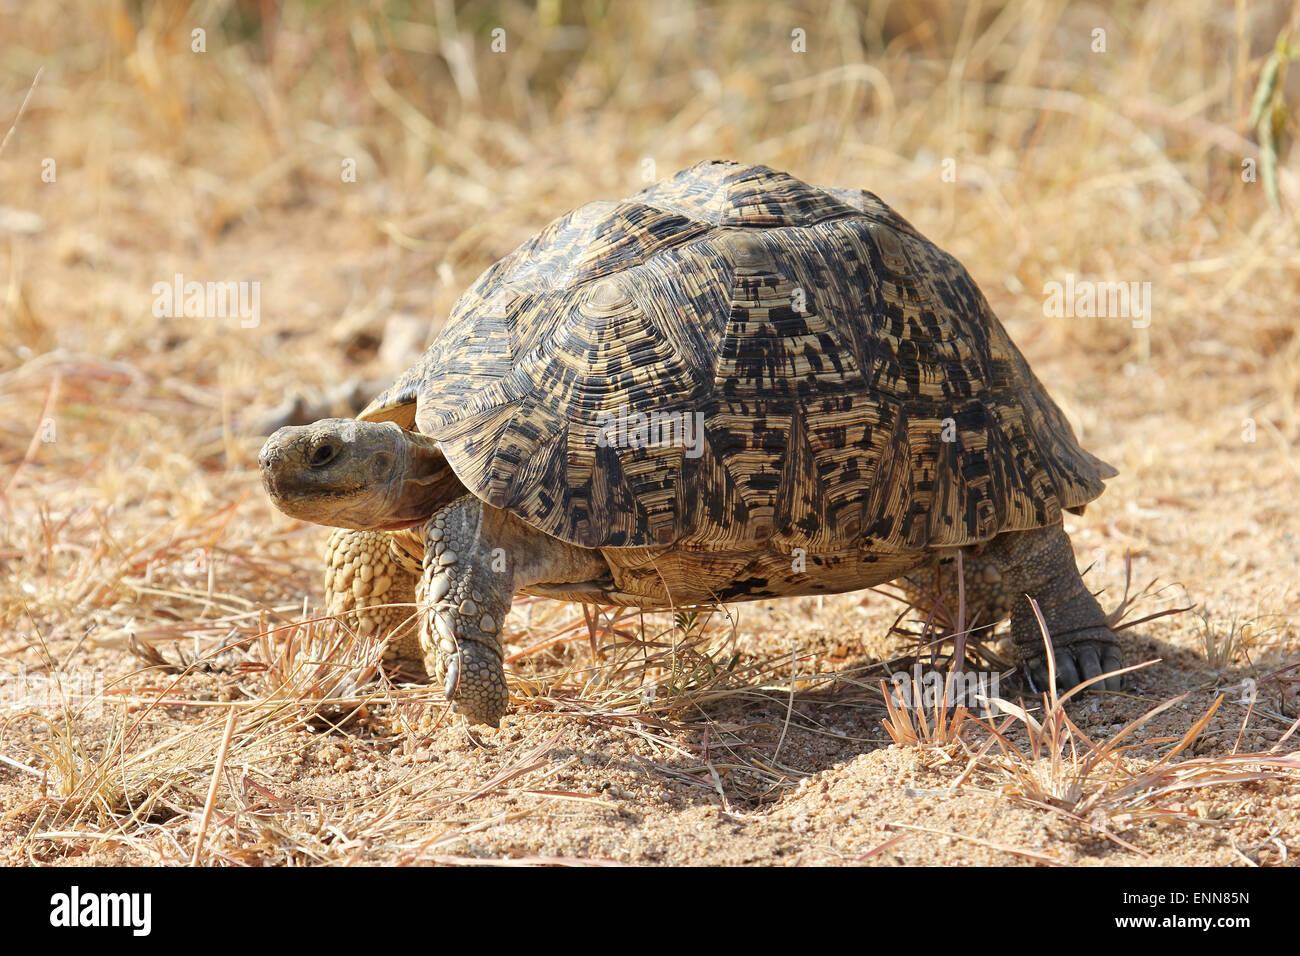 Leopard Tortoise on the move Stock Photo